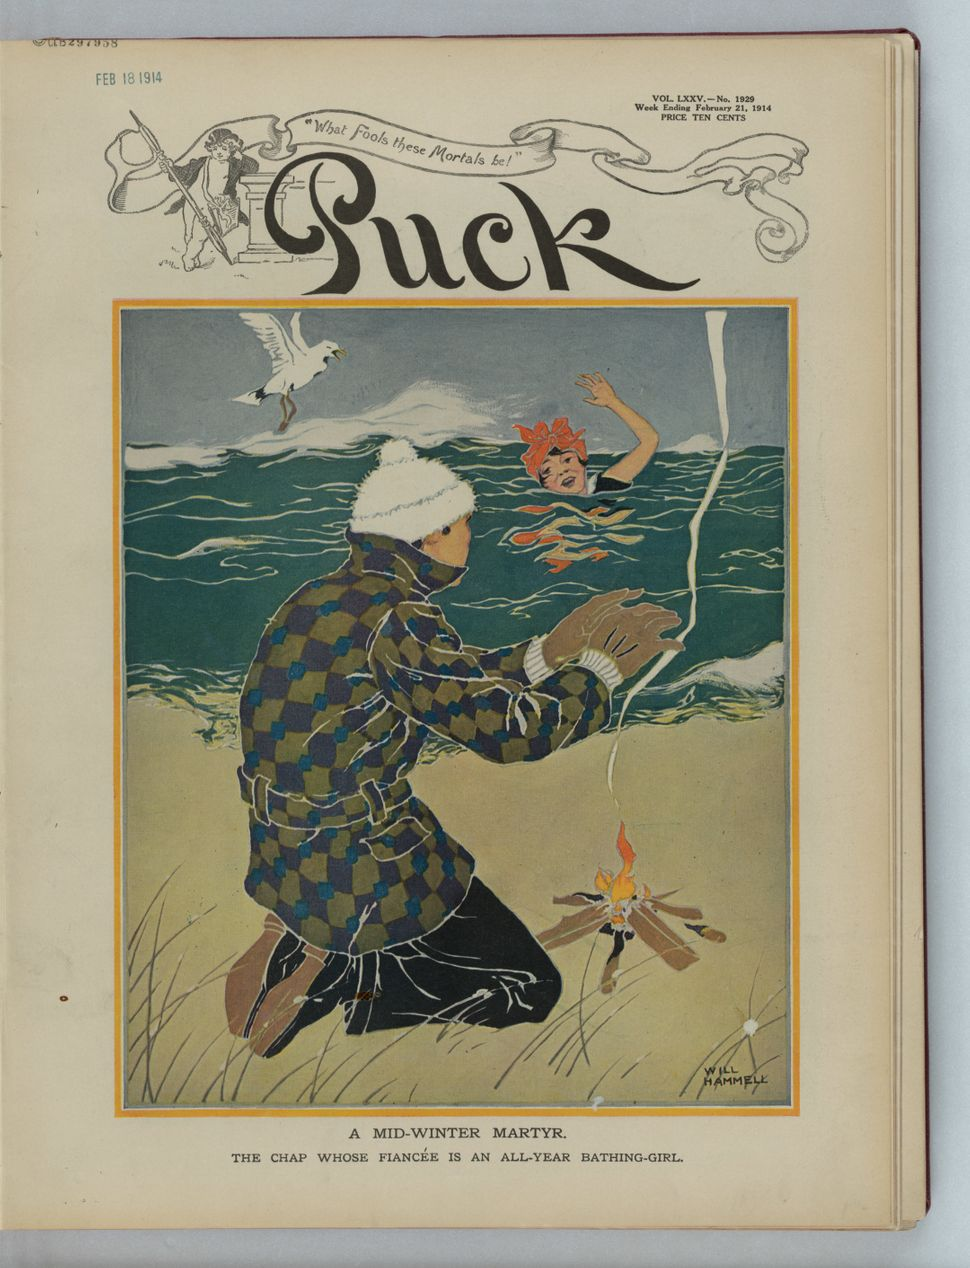 February 21, 1914 (Artist Will Hammell, 1888-1963)